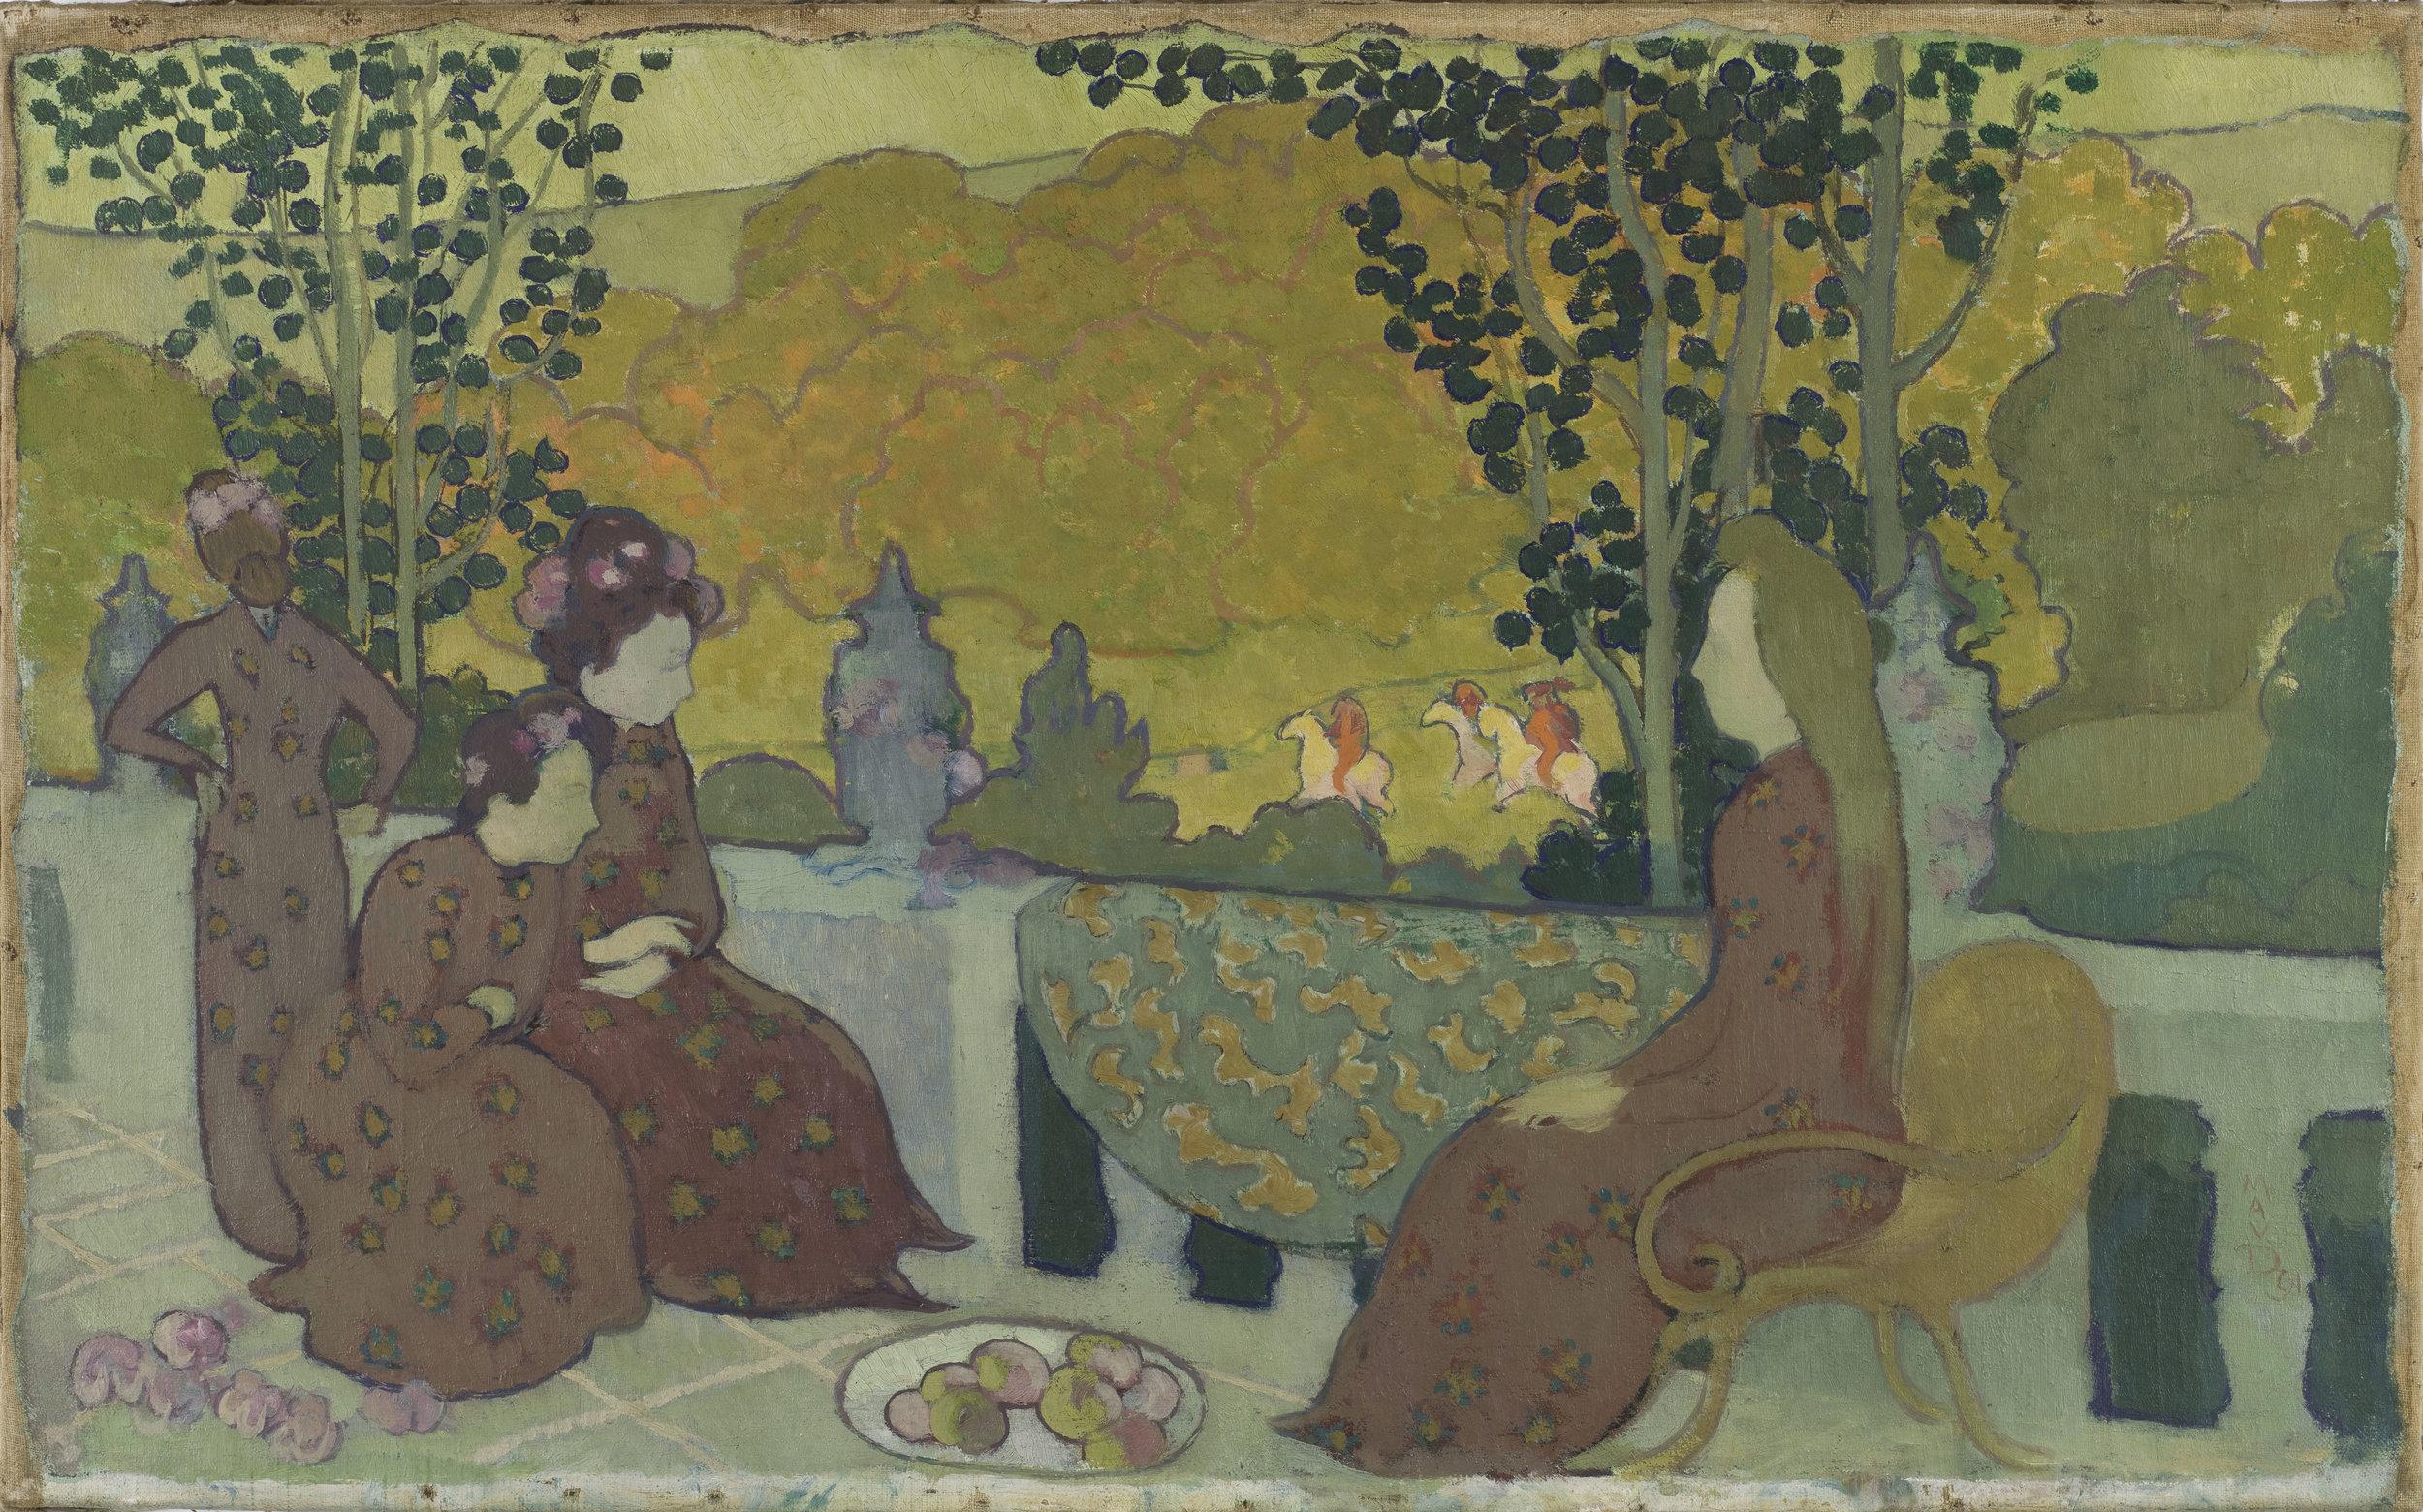 Maurice Denis (1870-1943).October, also known as October Evening, 1891. Oil on canvas.Musée d'Orsay, Paris.Photo © RMN-Grand Palais (musée d'Orsay) / Hervé Lewandowski.